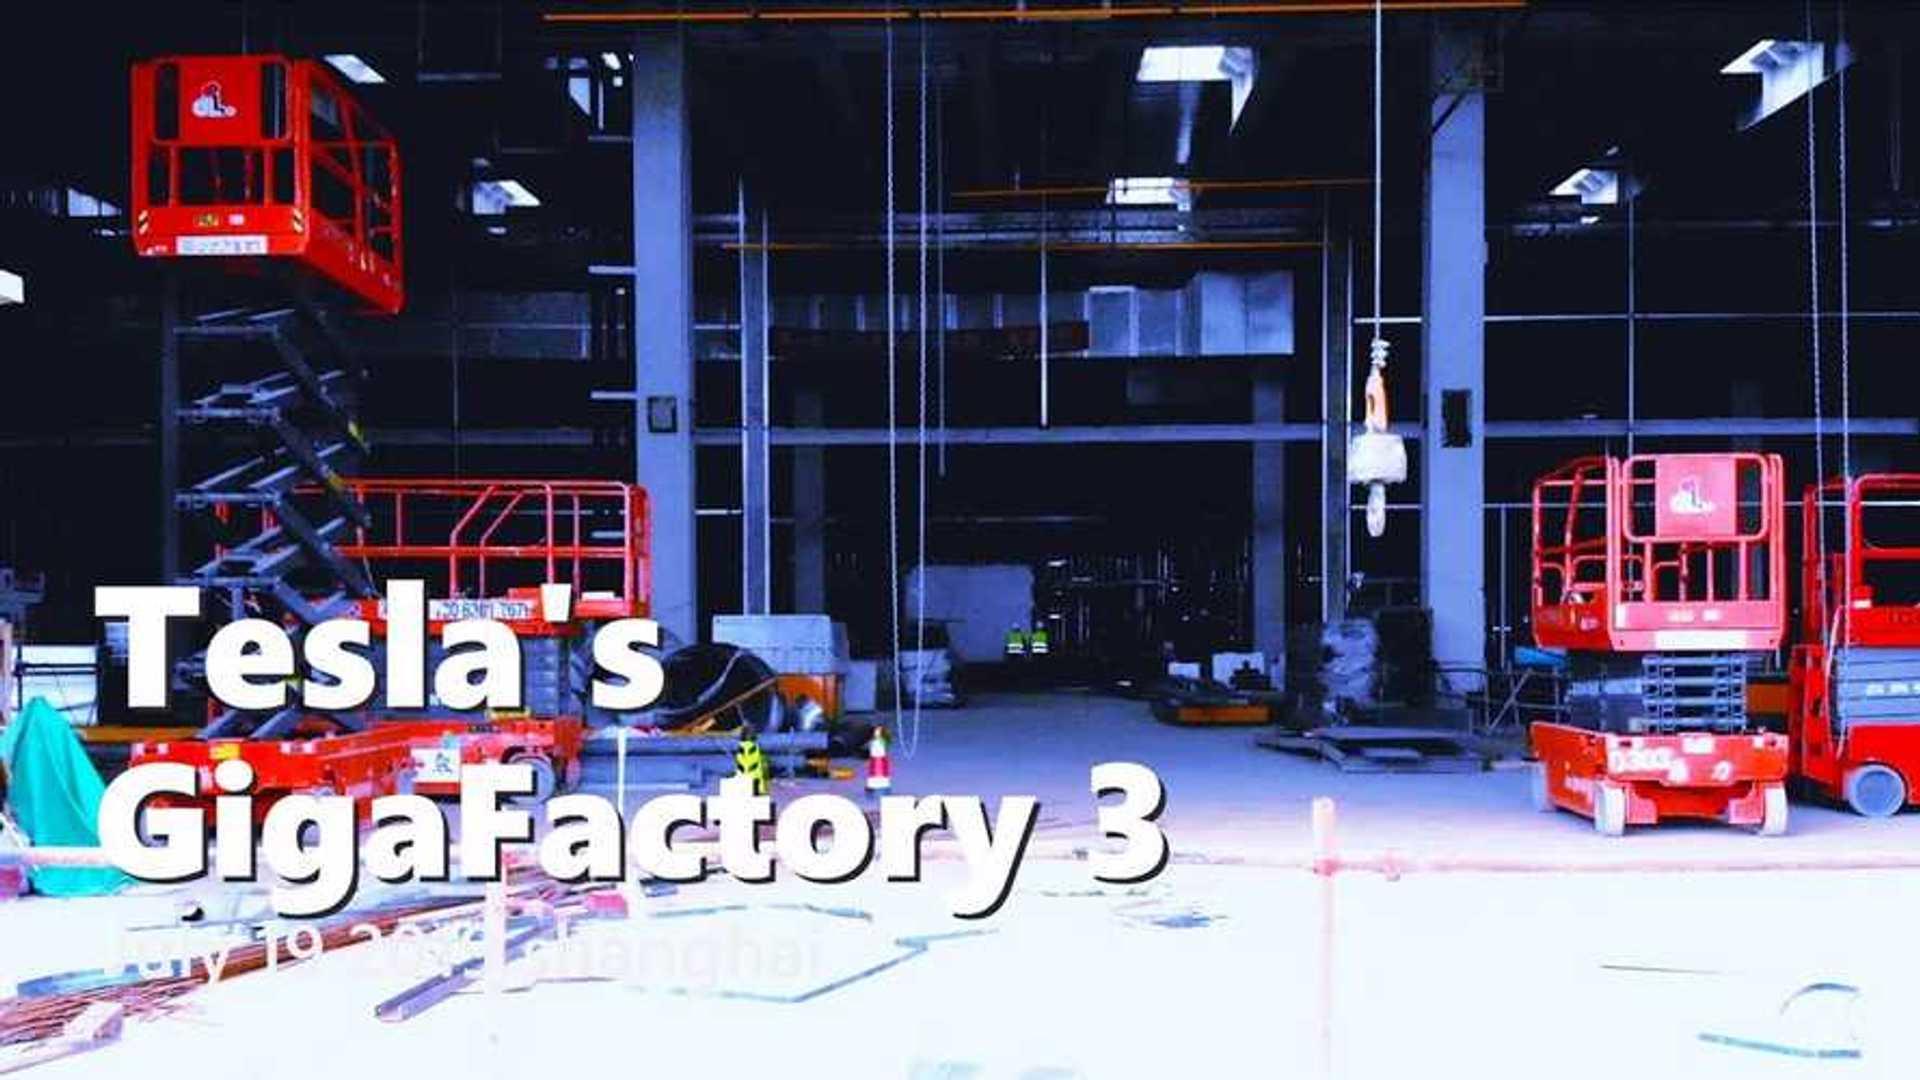 Tesla Gigafactory 3 Construction Progress July 19, 2019: Video